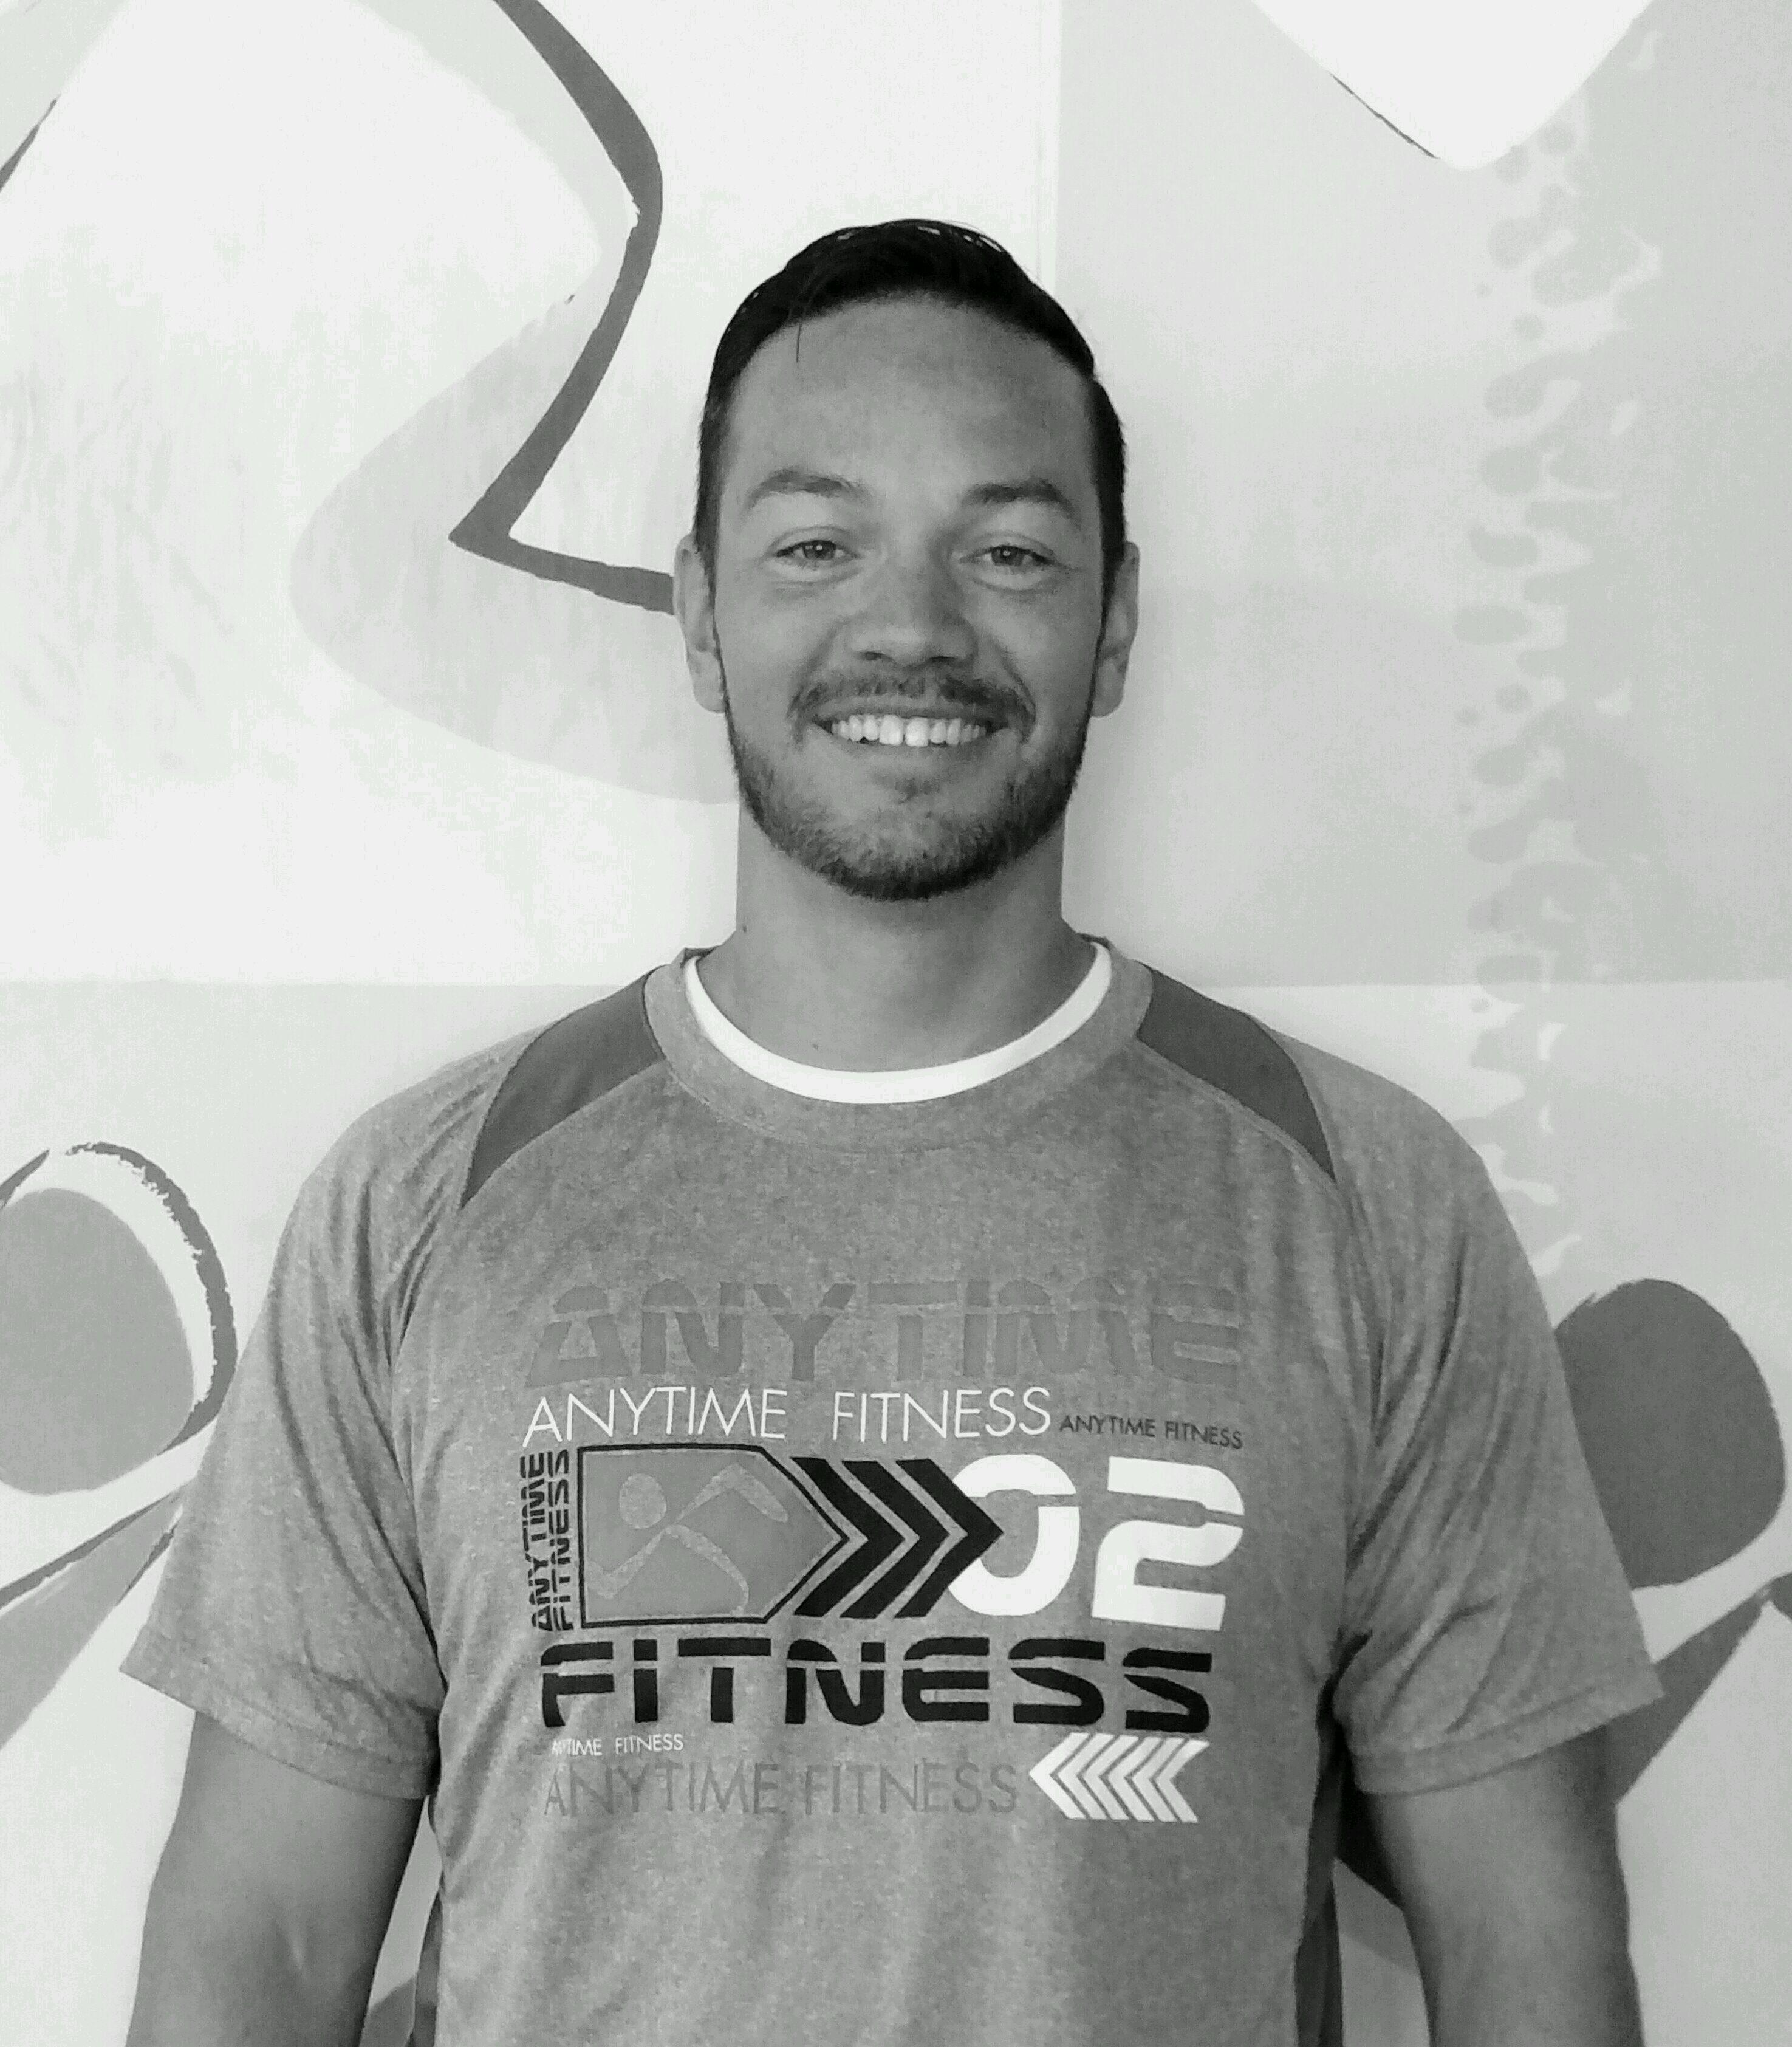 Seth Stabenow